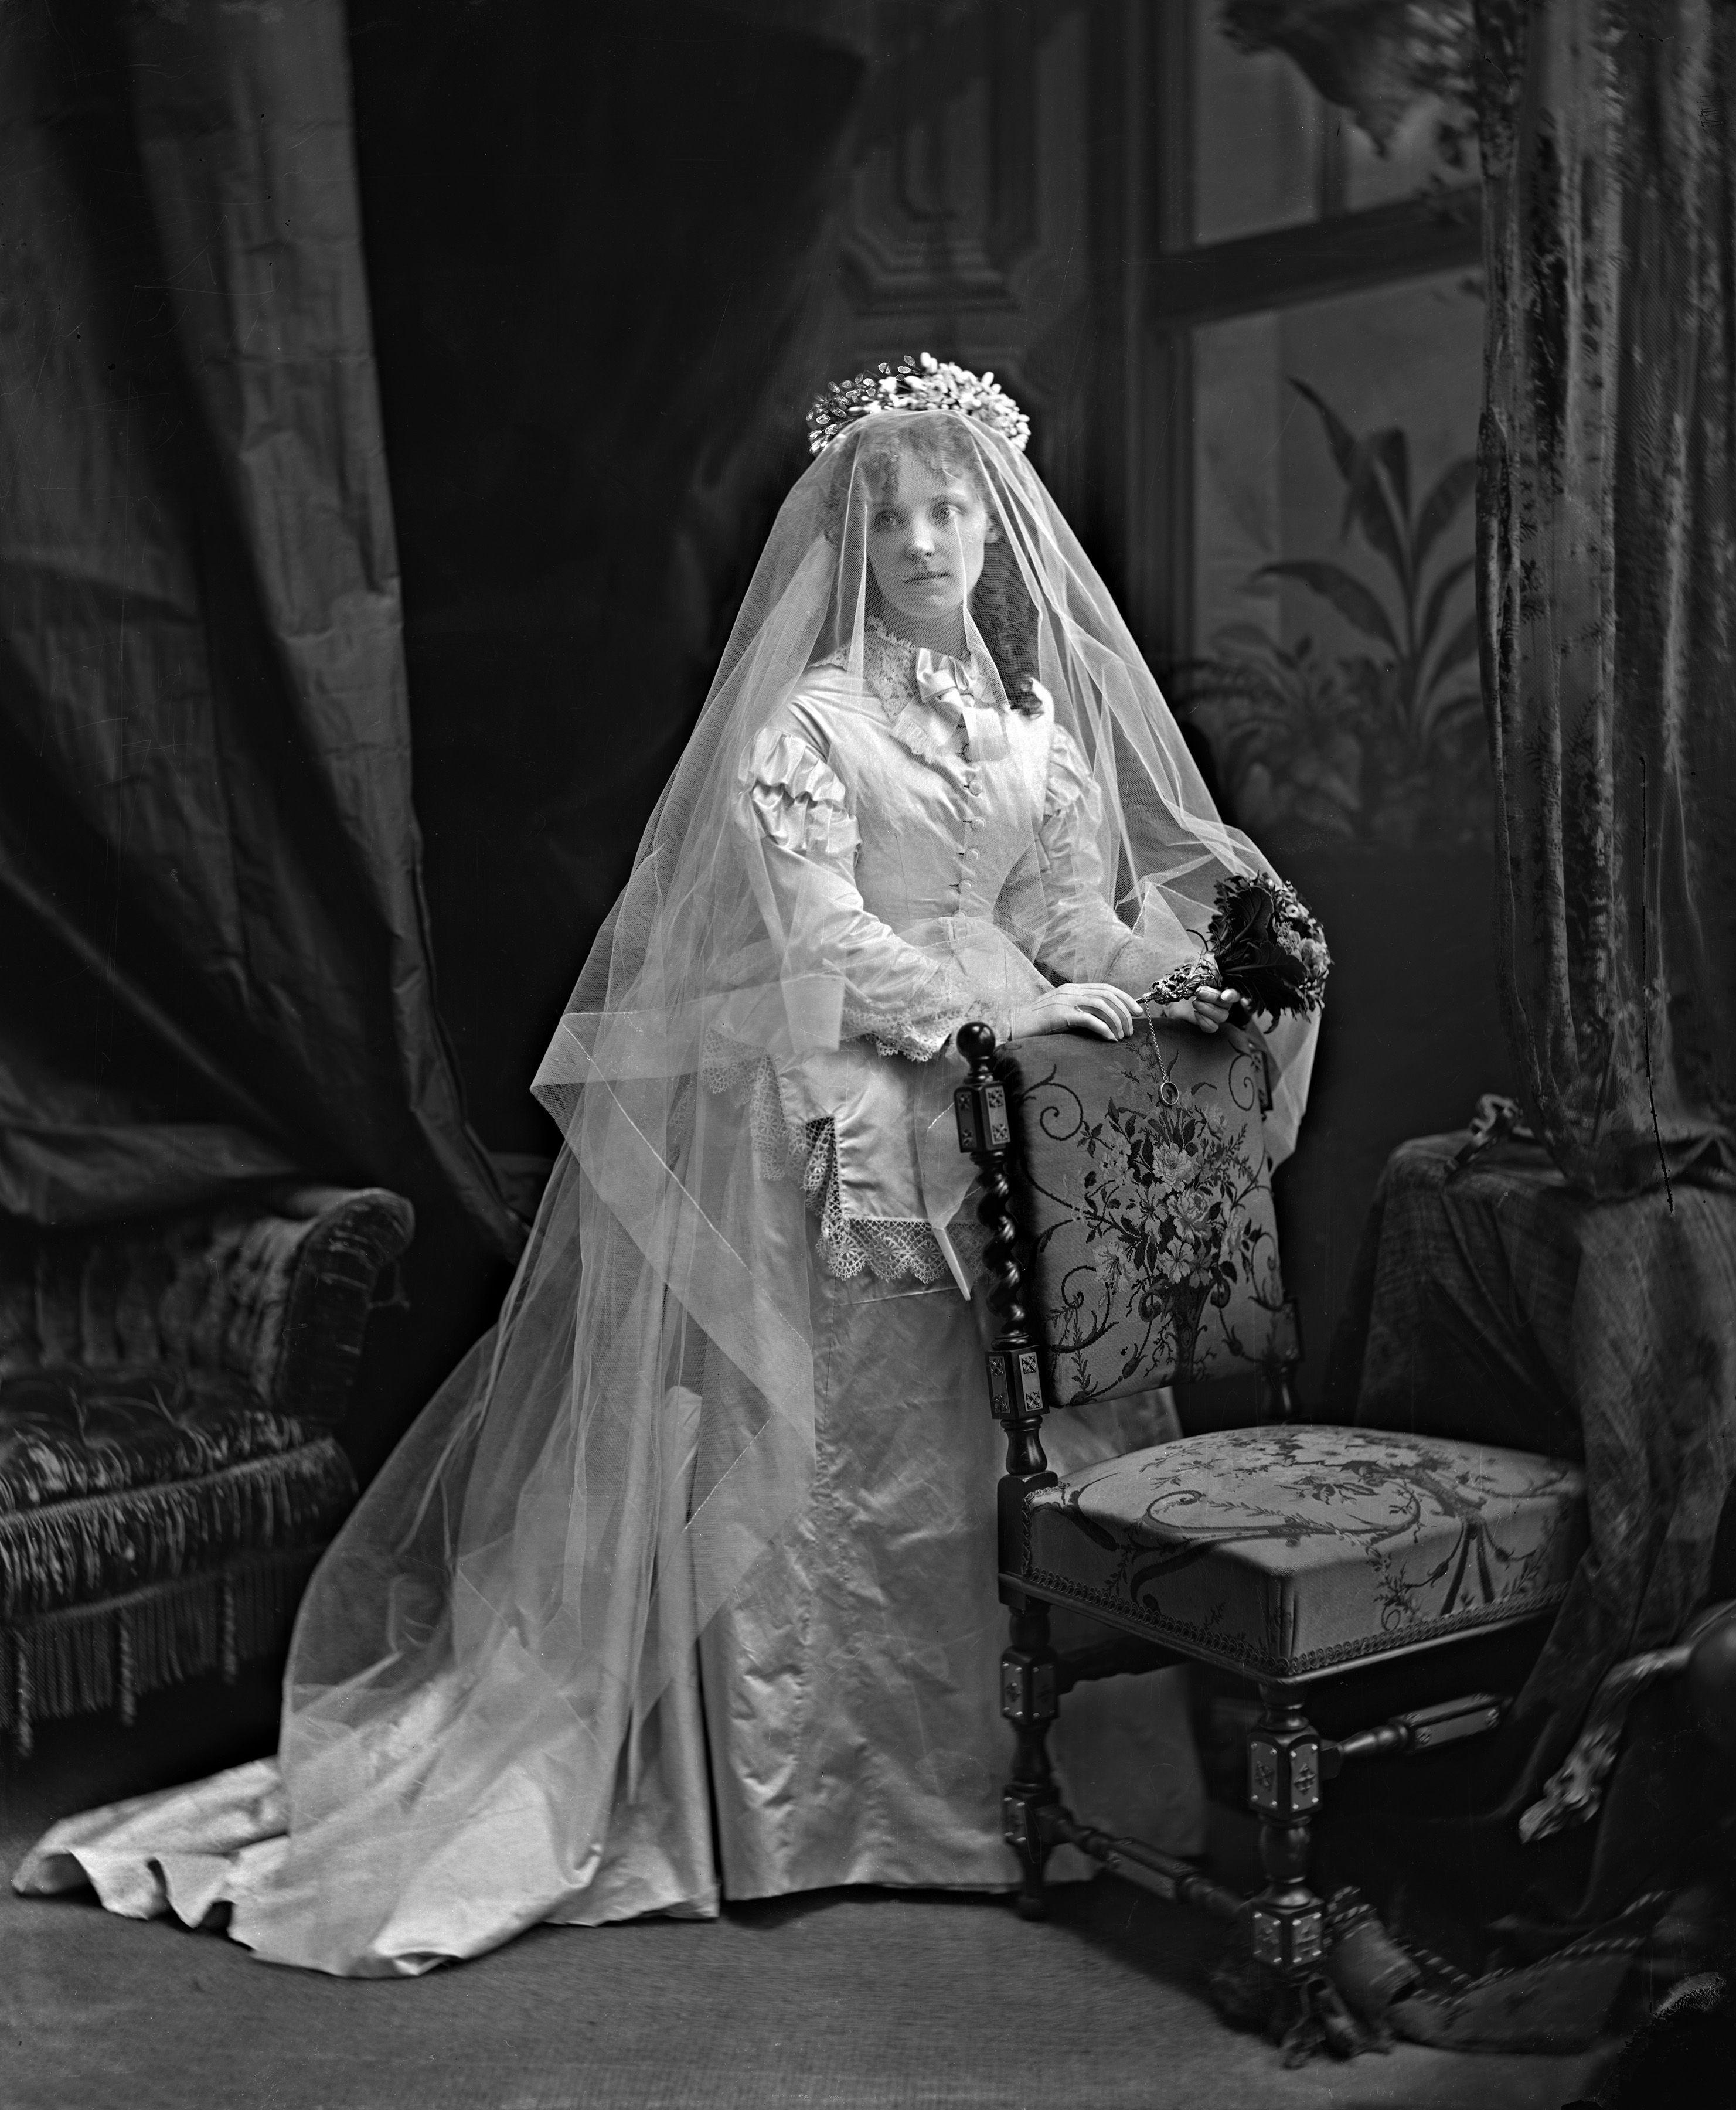 Bridget Delaney, Mme John Mason, En Robe De Mariée